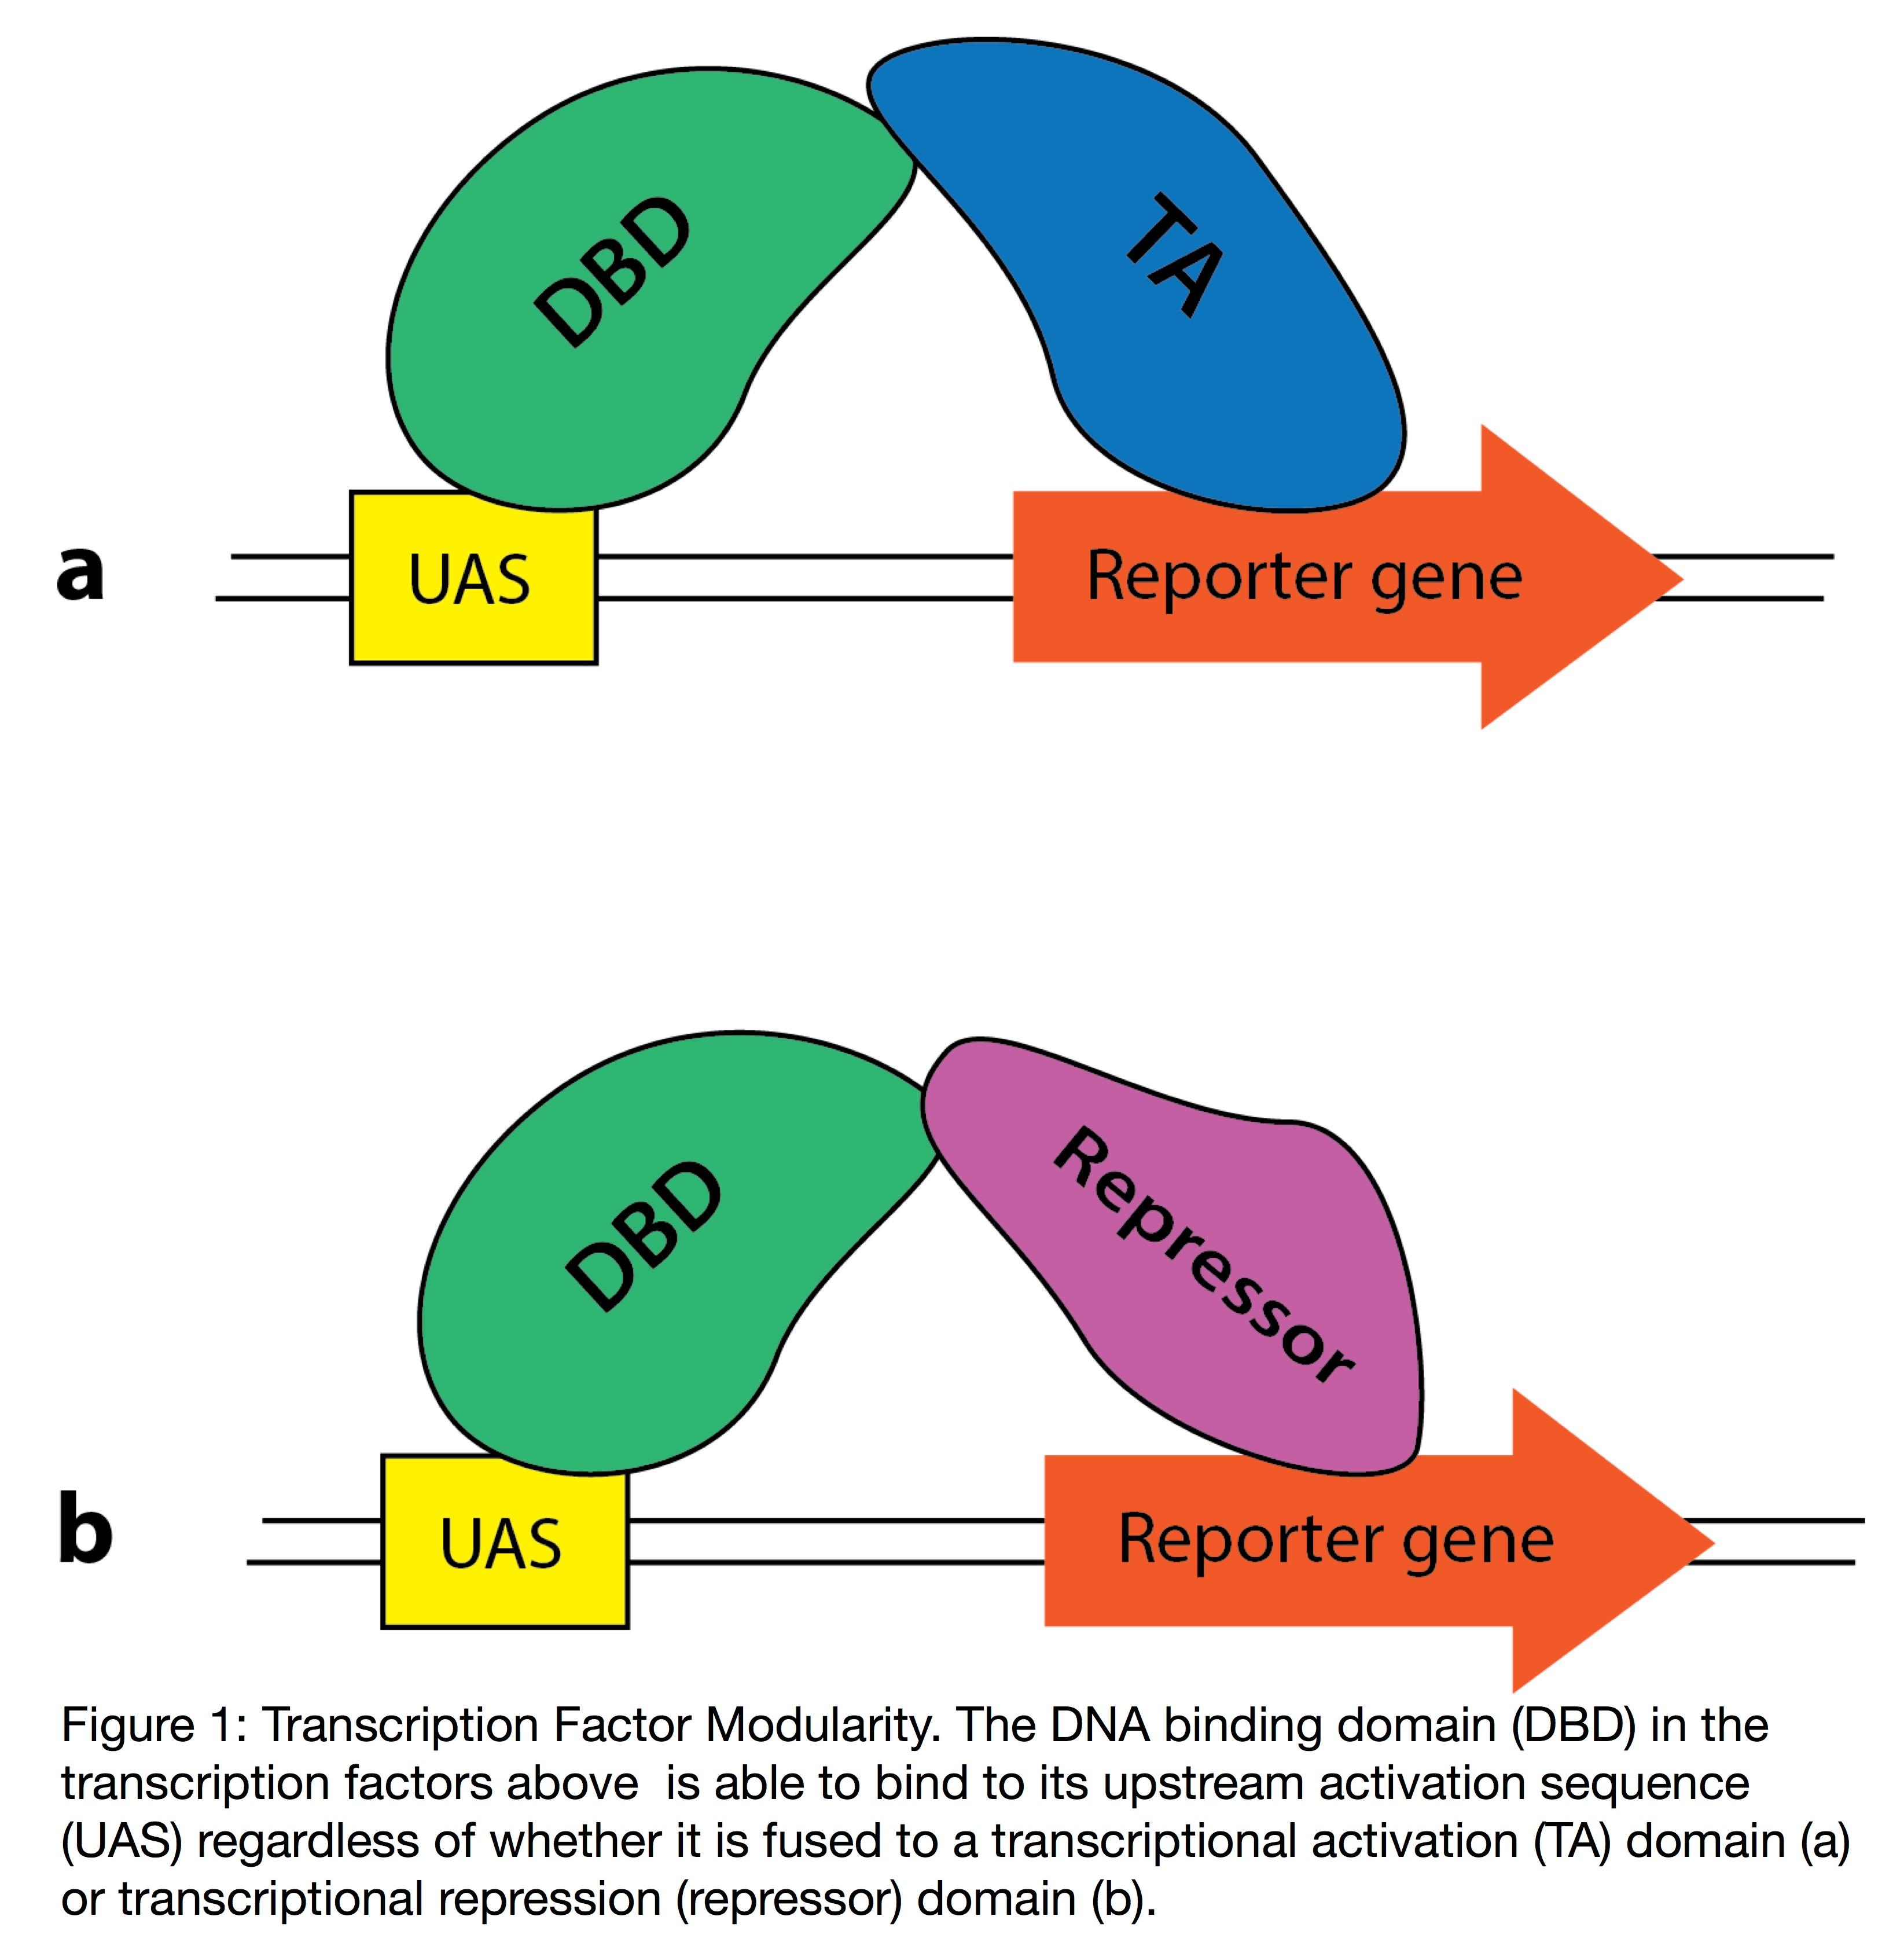 Transcription factor modularity